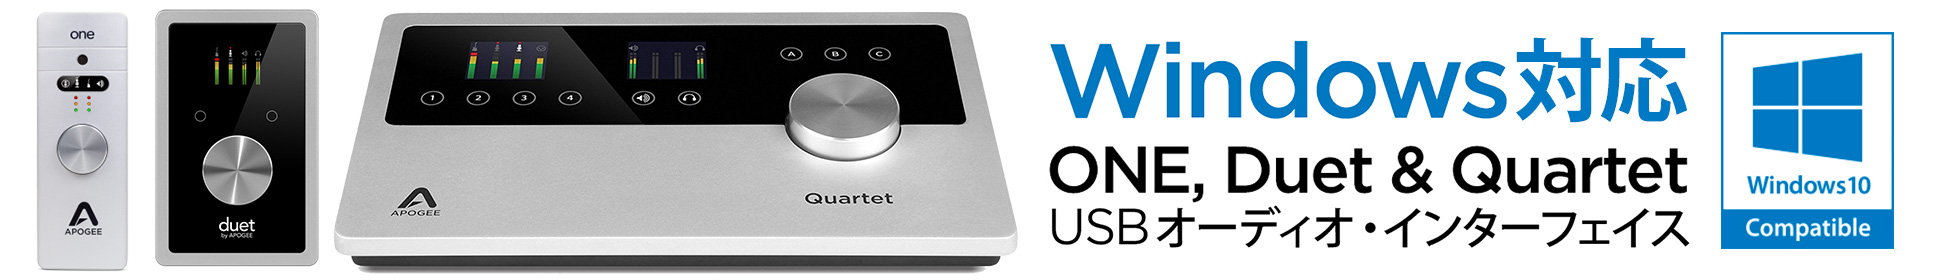 Apogee ONE、Duet、Quartet、Windows 10対応ドライバー公開!